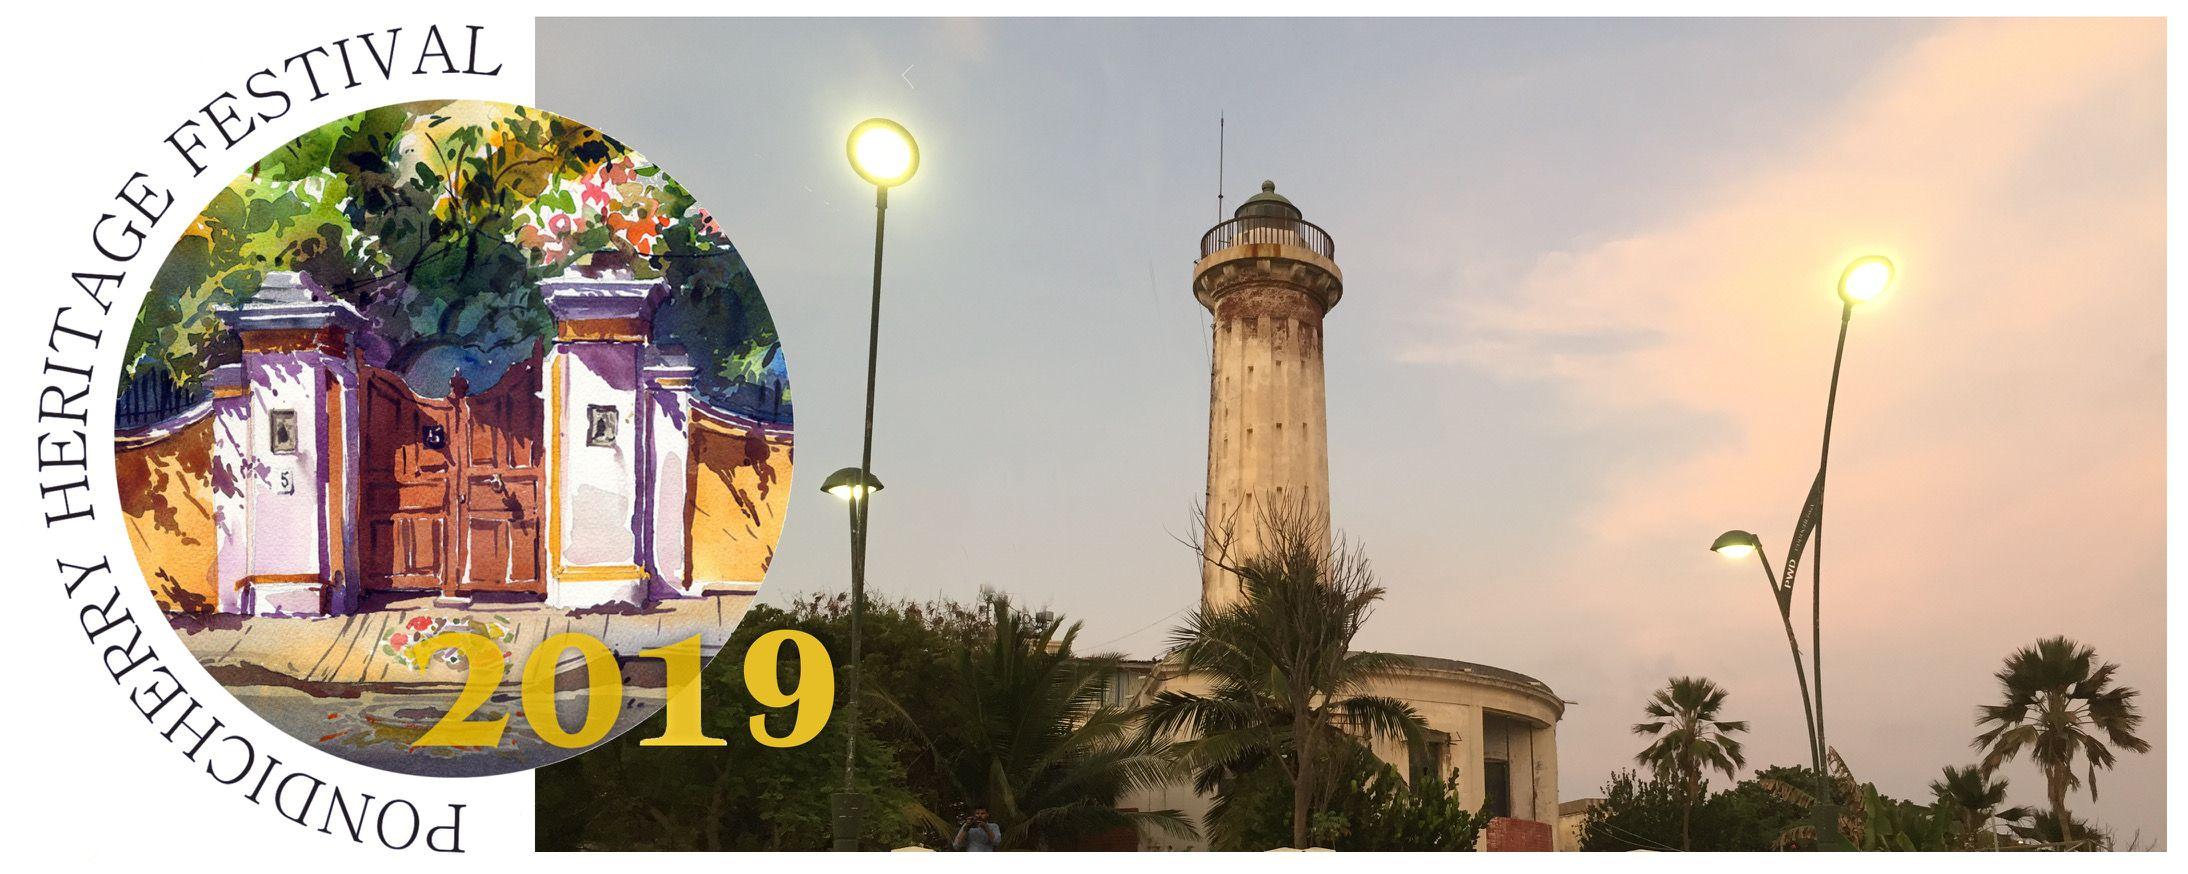 PONDICHERRY HERITAGE FESTIVAL 2019 ORGANISED IN PONDICHERRY IN 2019 CELEBRATES HERITAGE OF PONDICHERRY